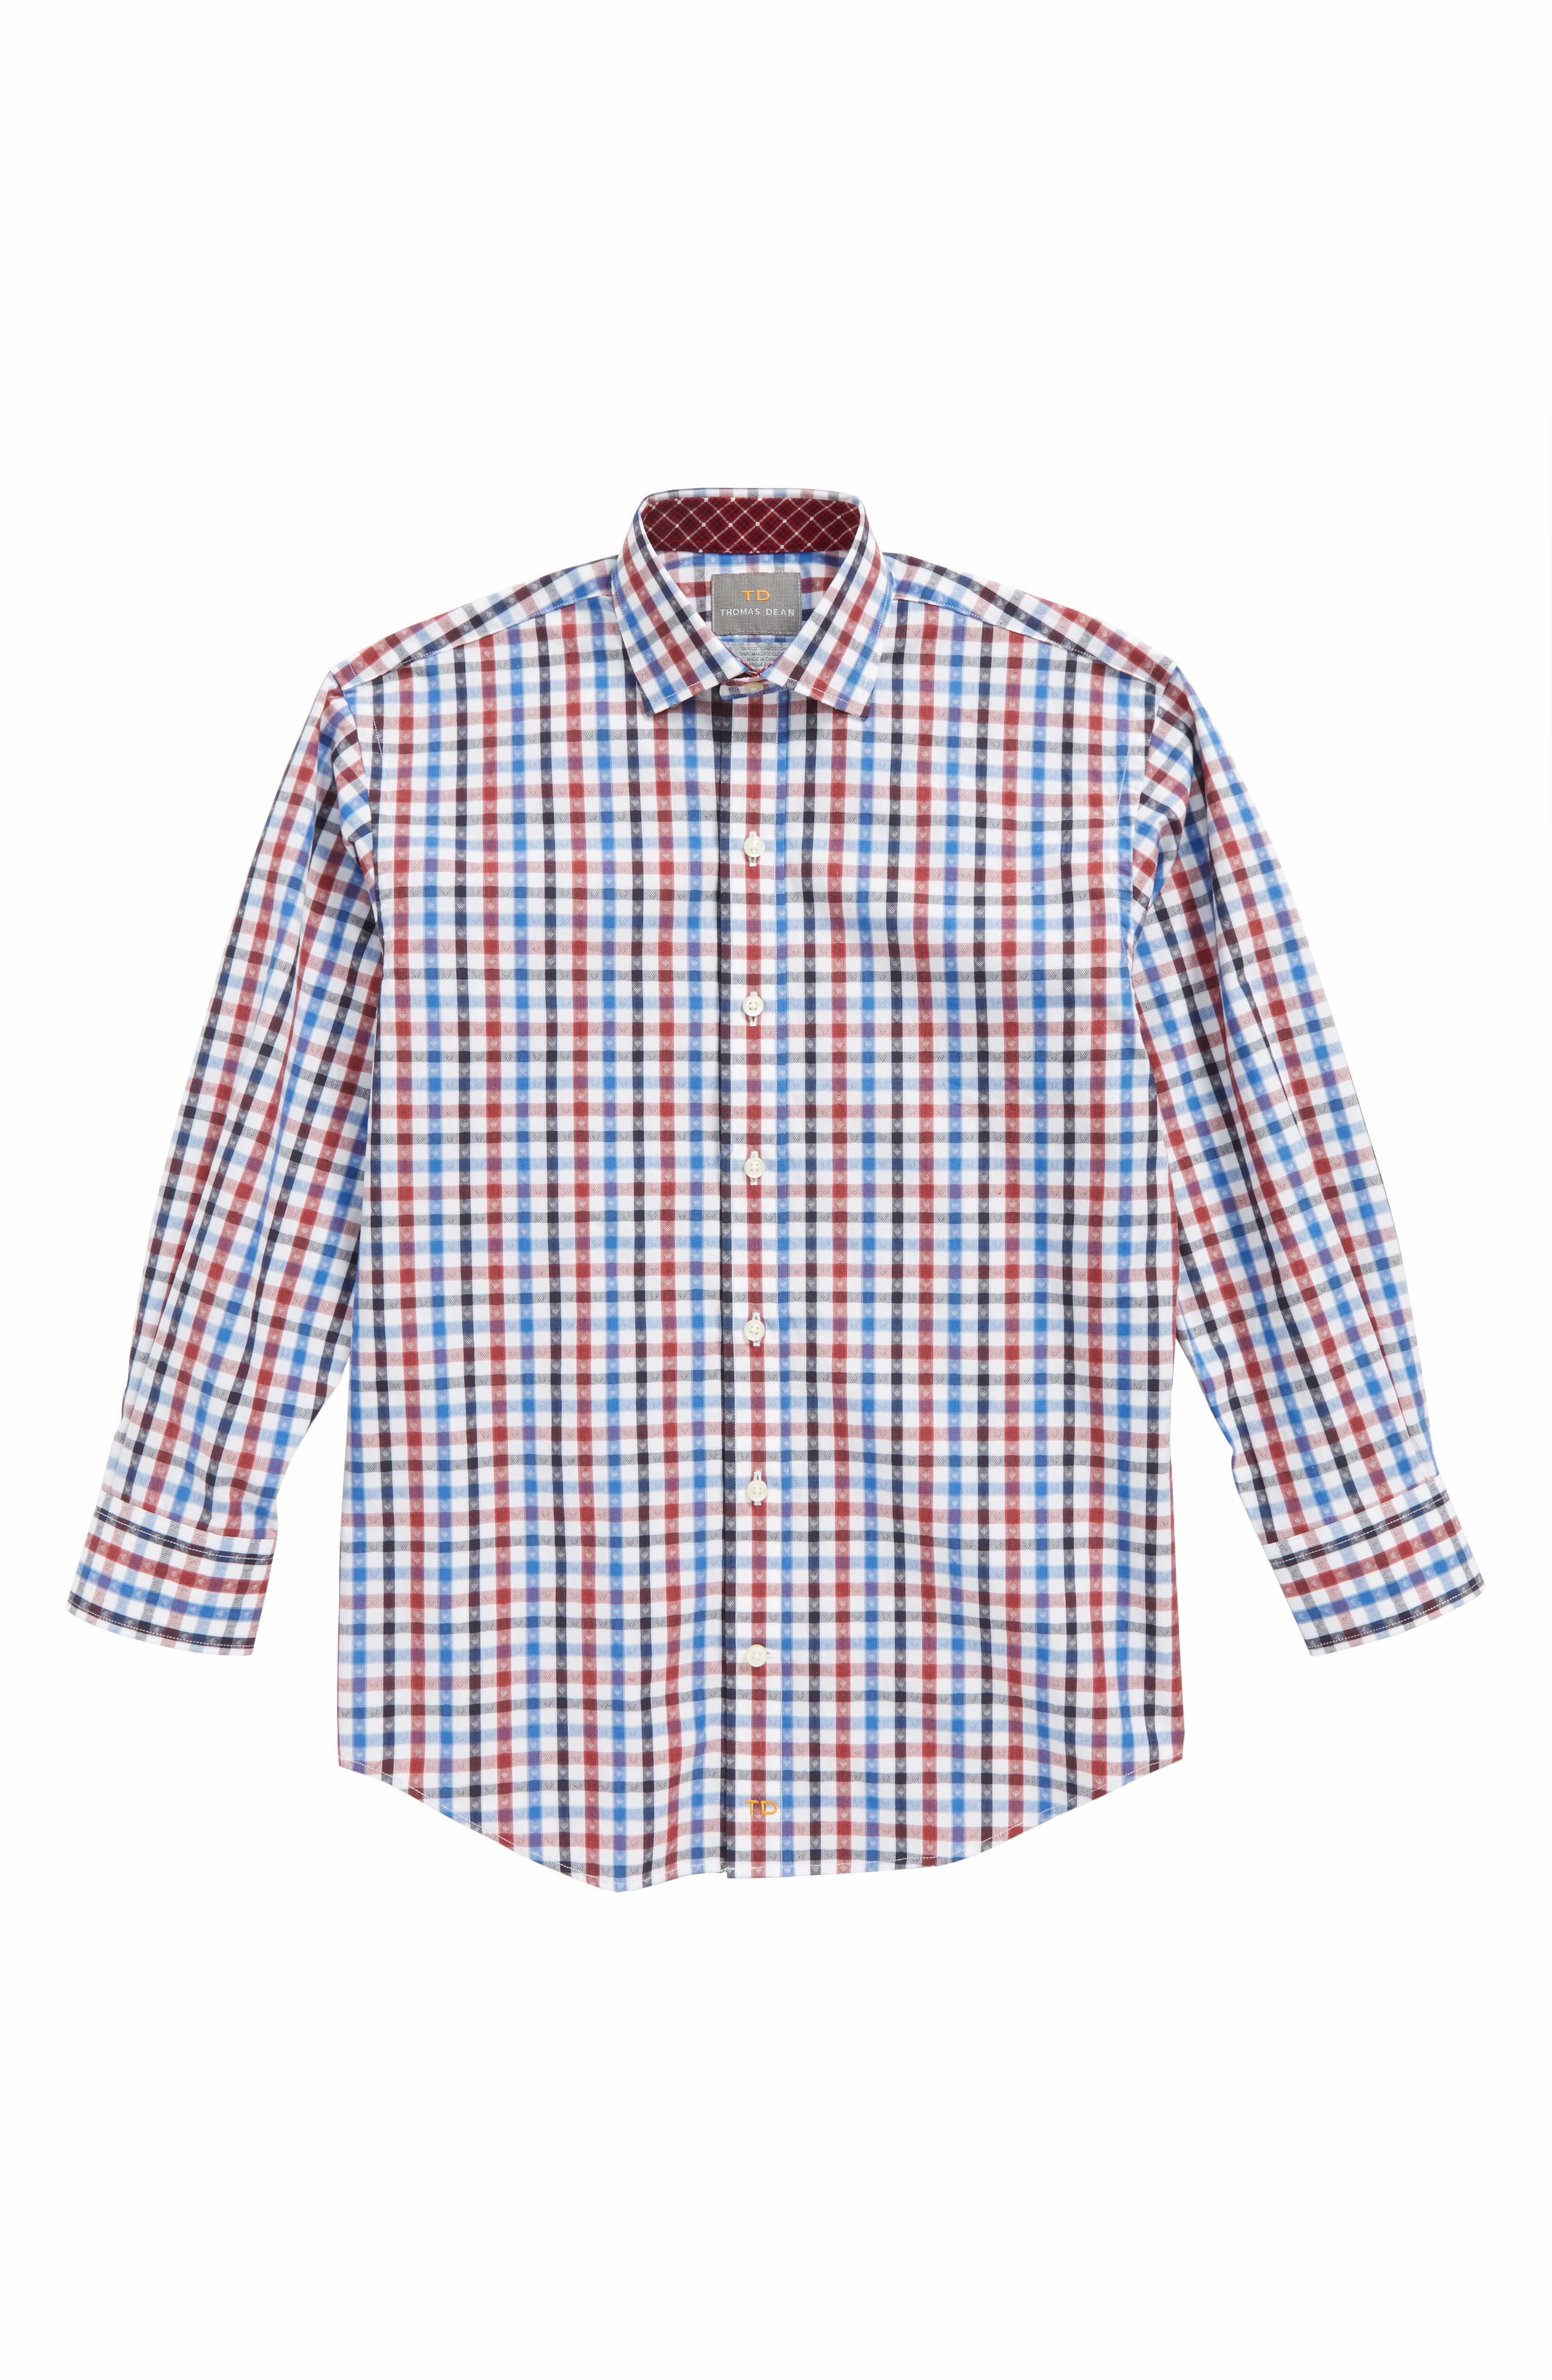 Shadow Check Dress Shirt,                         Main,                         color, Red